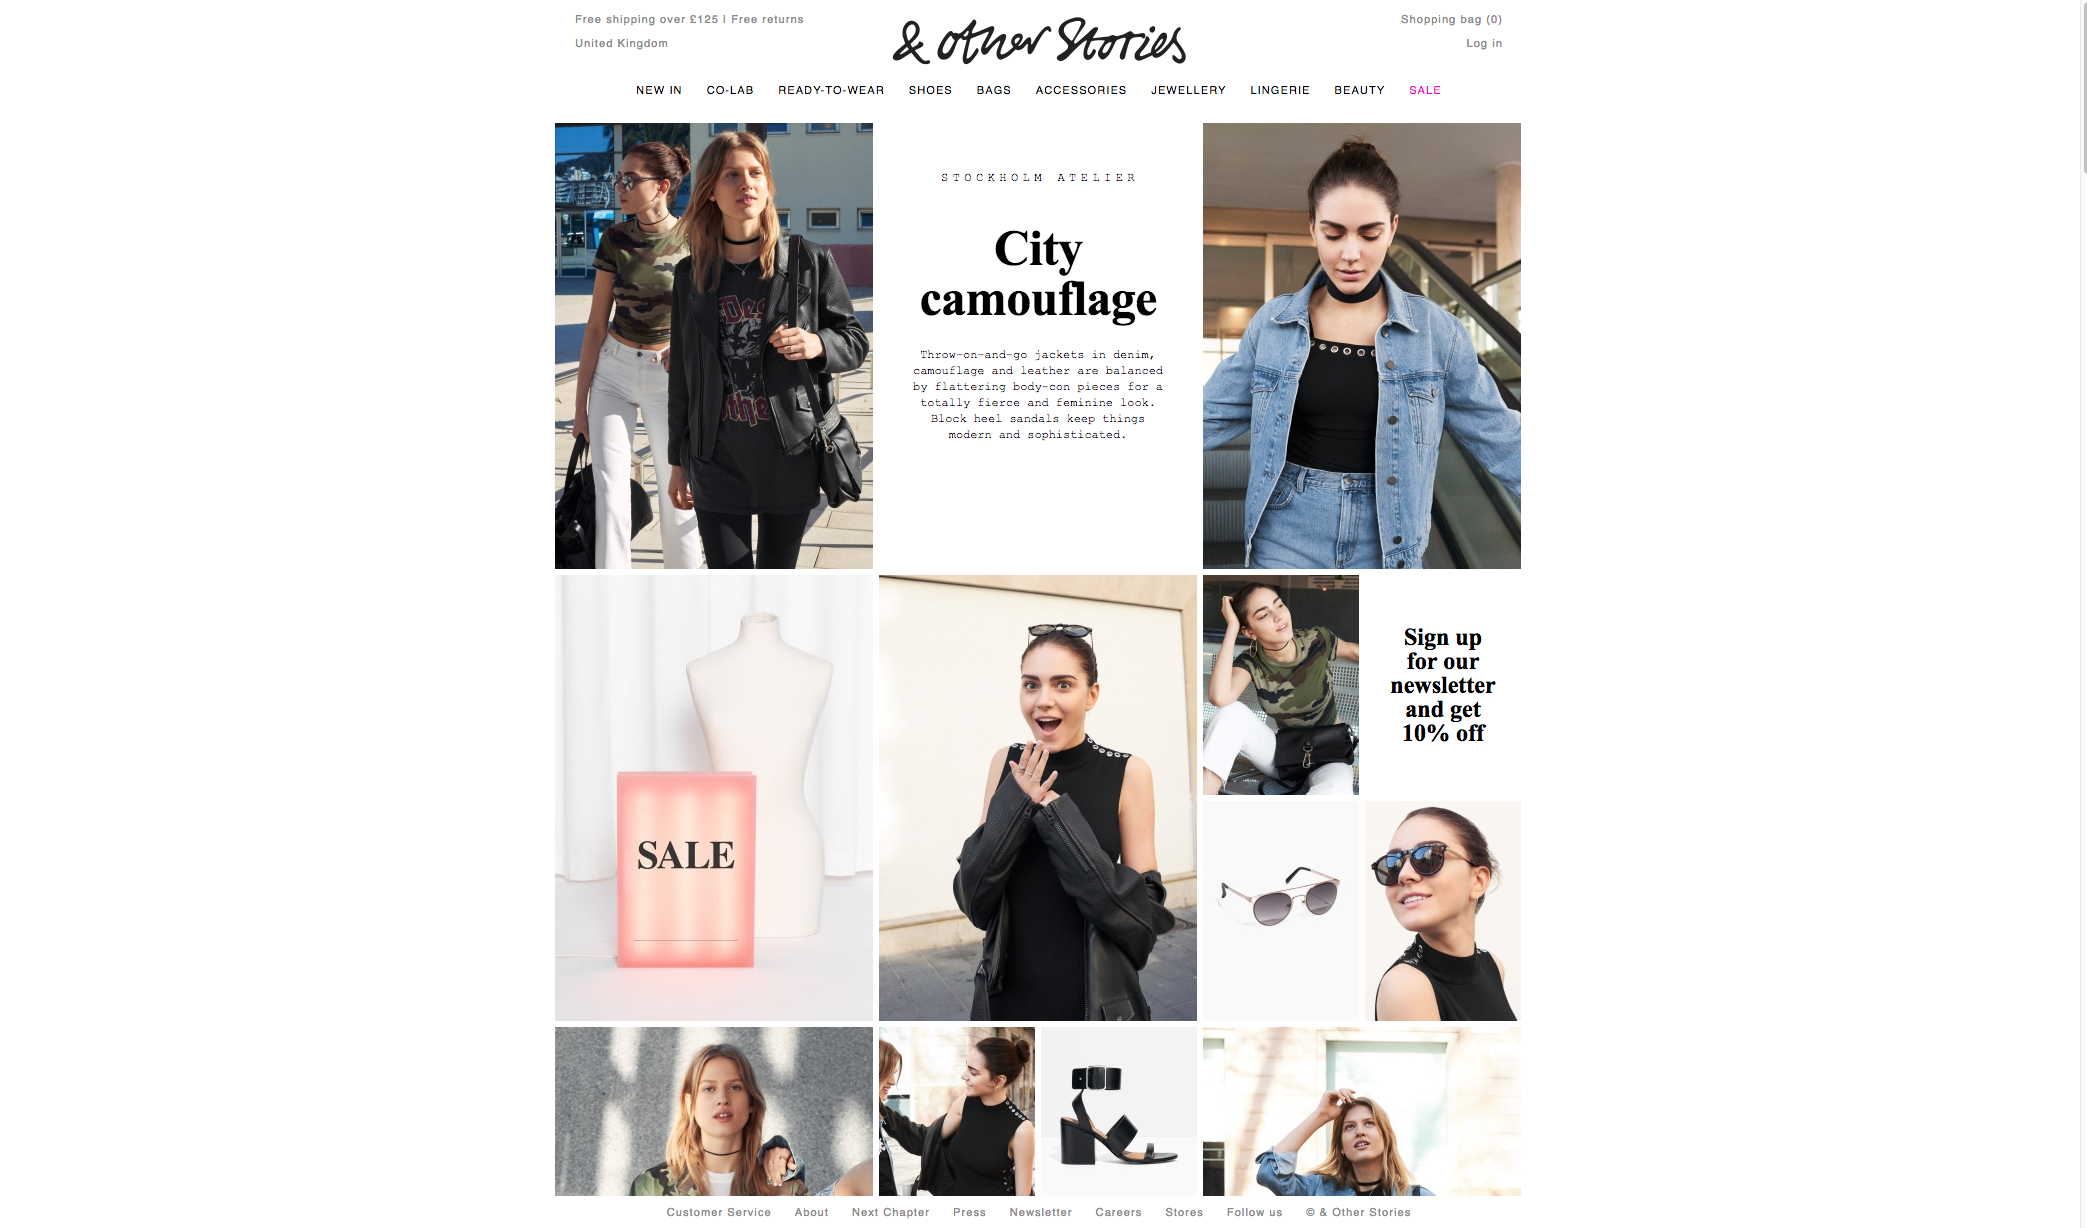 & Other Stories website